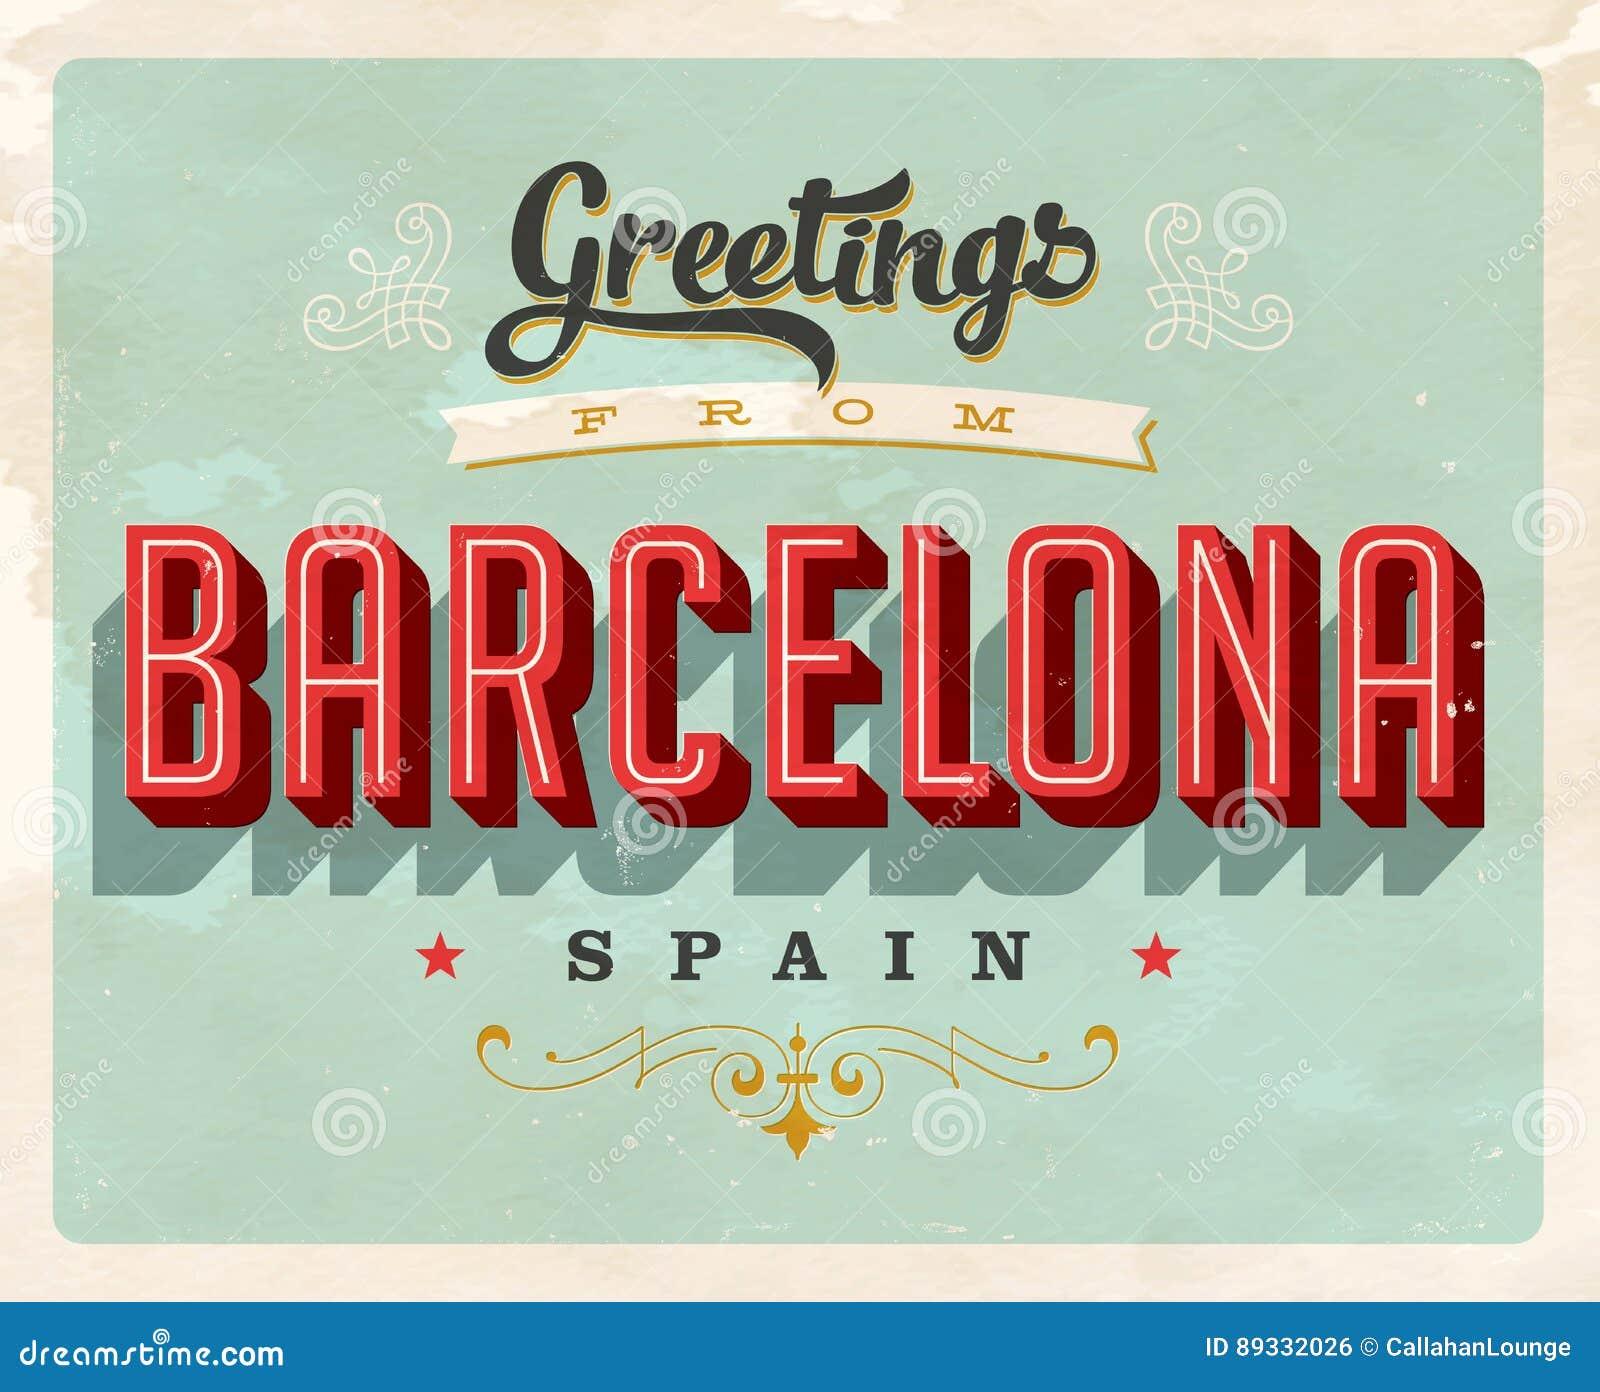 Vintage greetings from barcelona spain vacation card stock vector download vintage greetings from barcelona spain vacation card stock vector illustration of break m4hsunfo